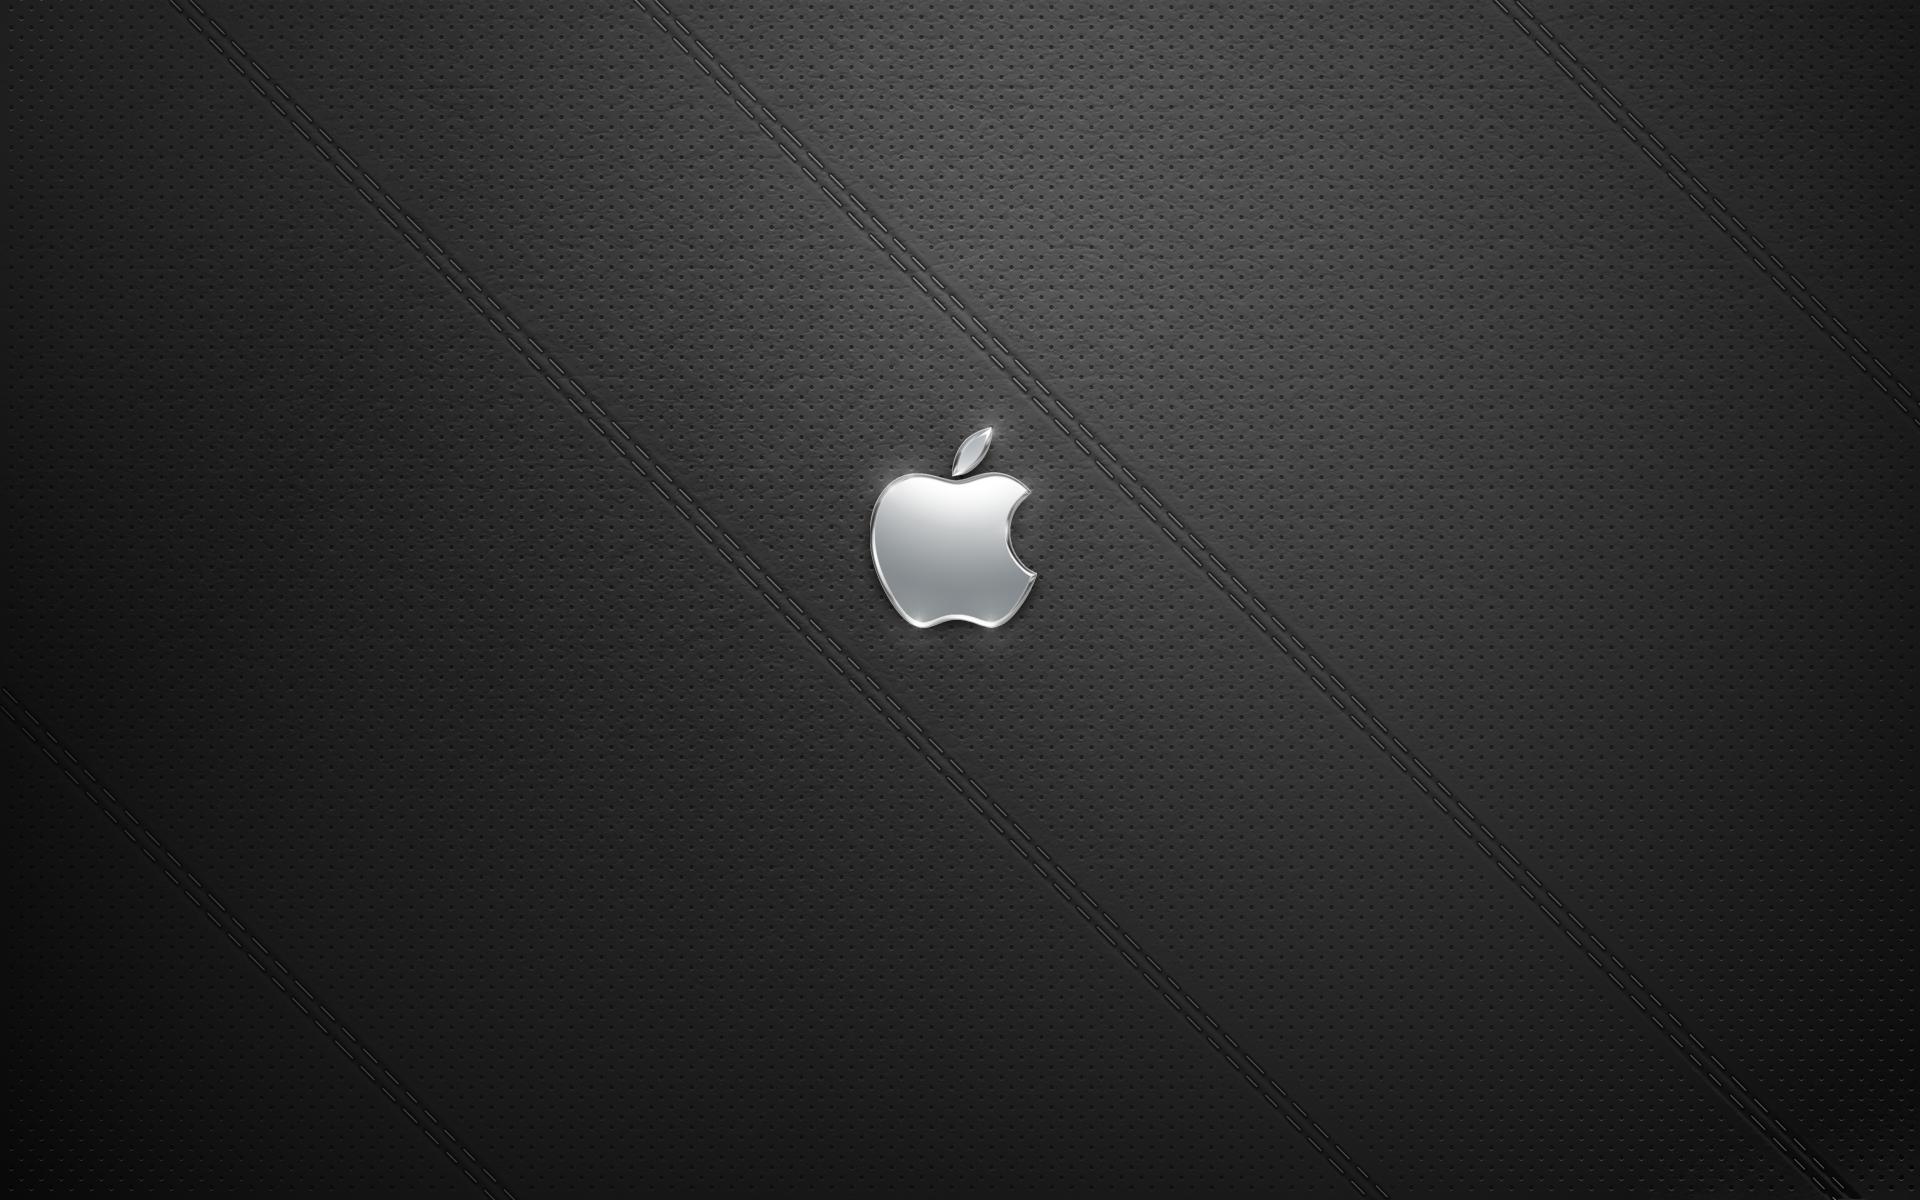 The Art of Adam Betts Black Leather Apple Desktop Background 1920x1200